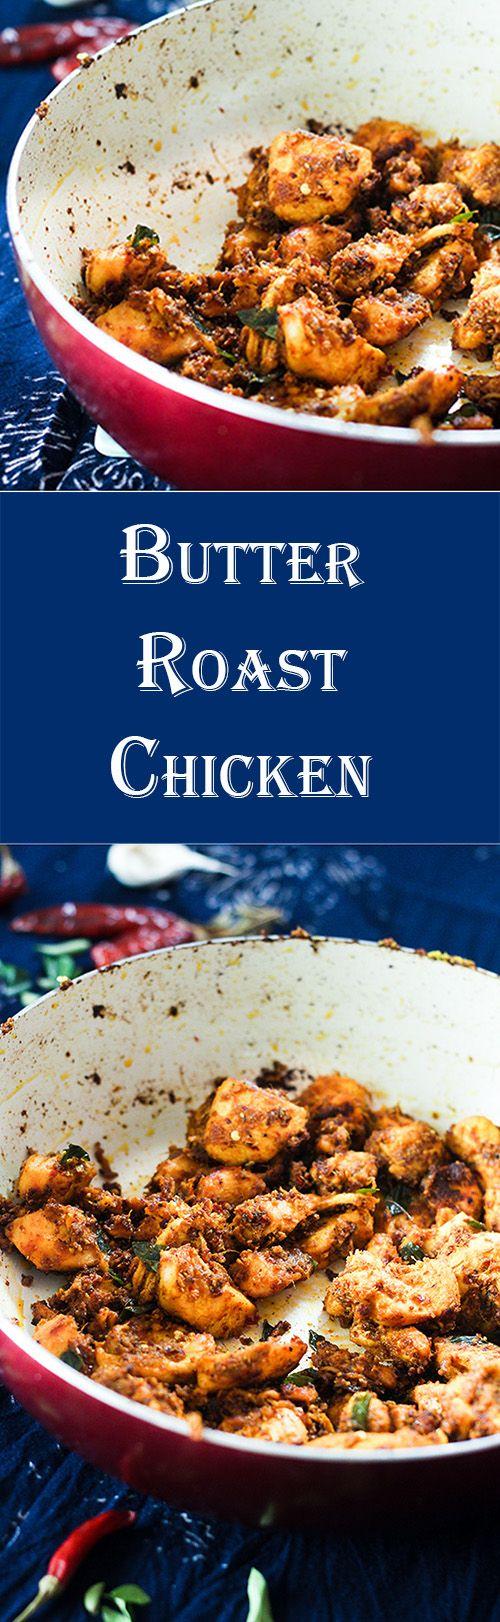 The 25 best white chicken korma recipe ideas on pinterest butter roast chicken chicken korma reciperoast forumfinder Images